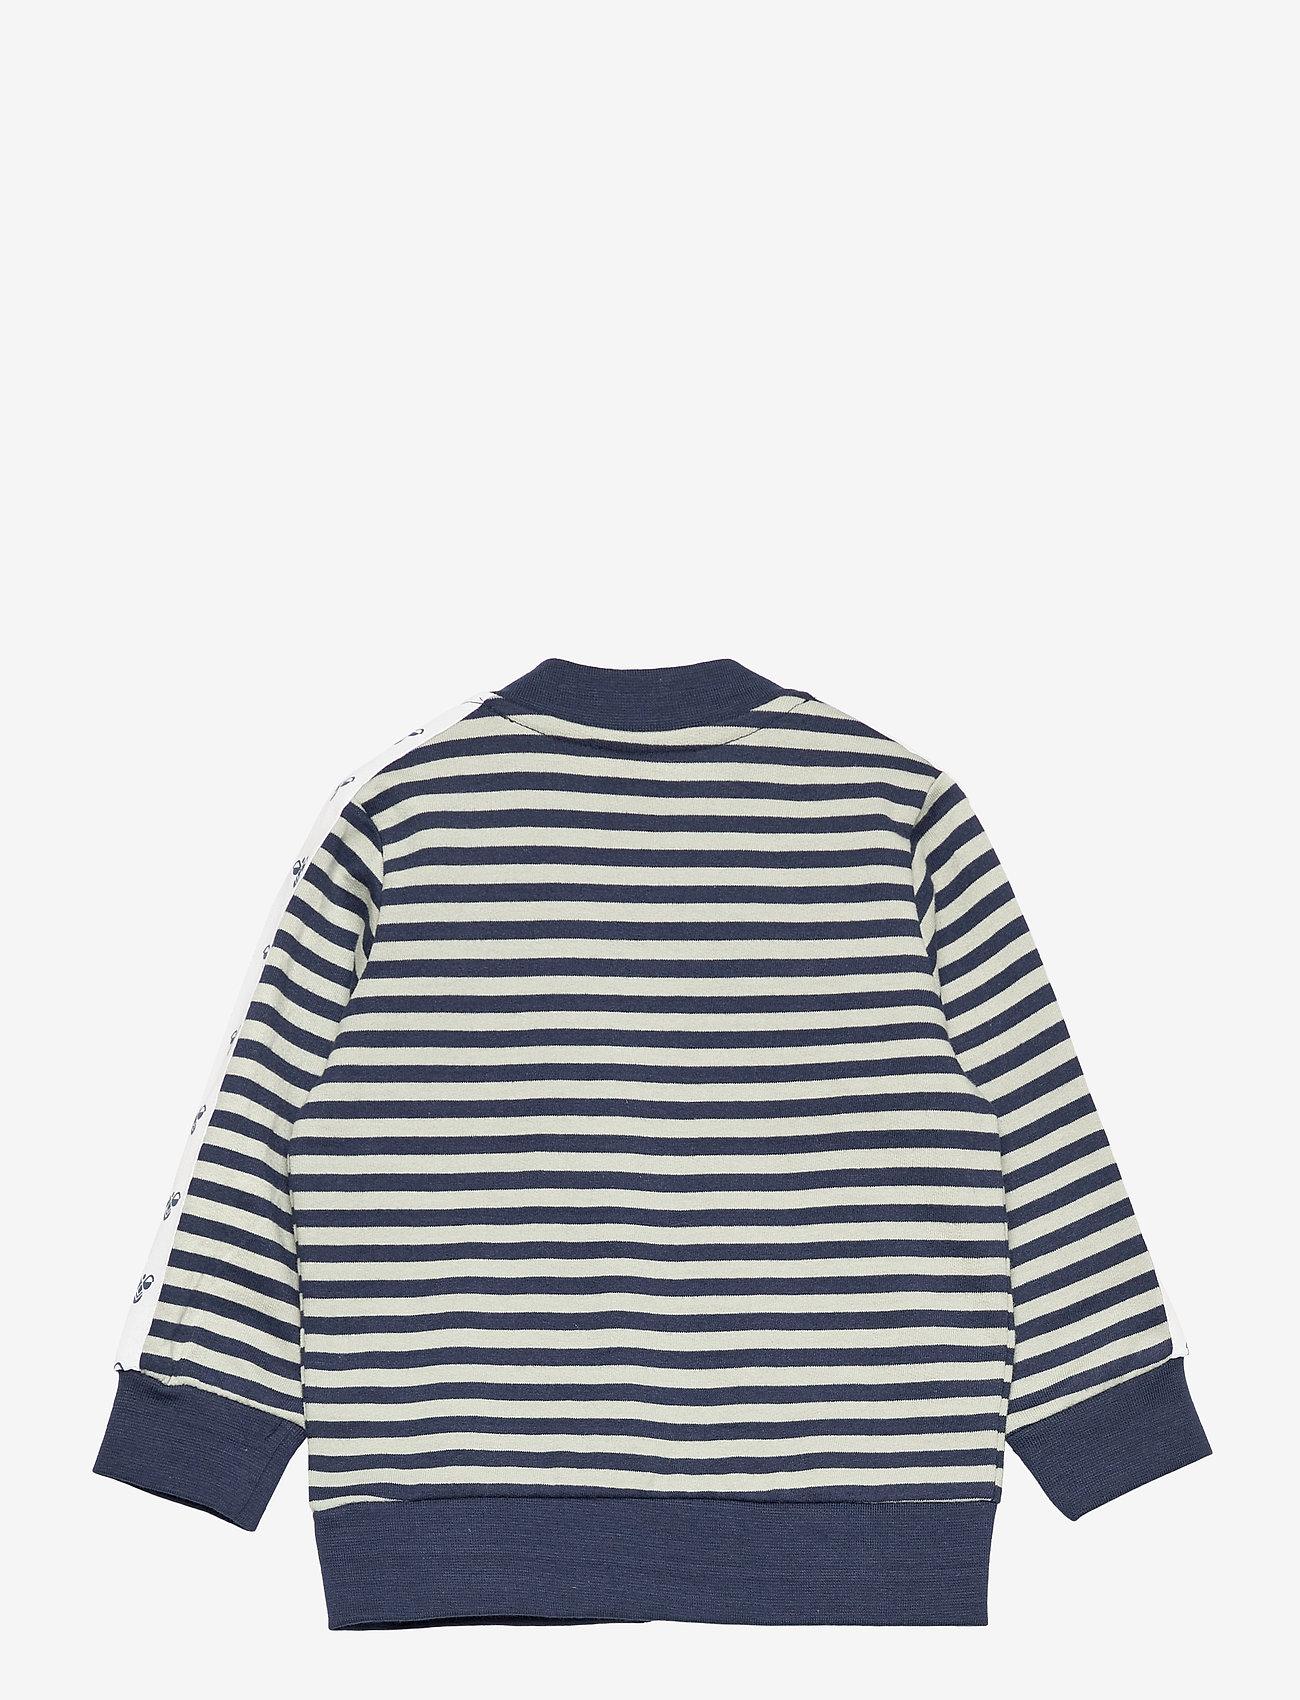 Hummel - hmlVILLUM ZIP JACKET - sweatshirts - black iris - 1